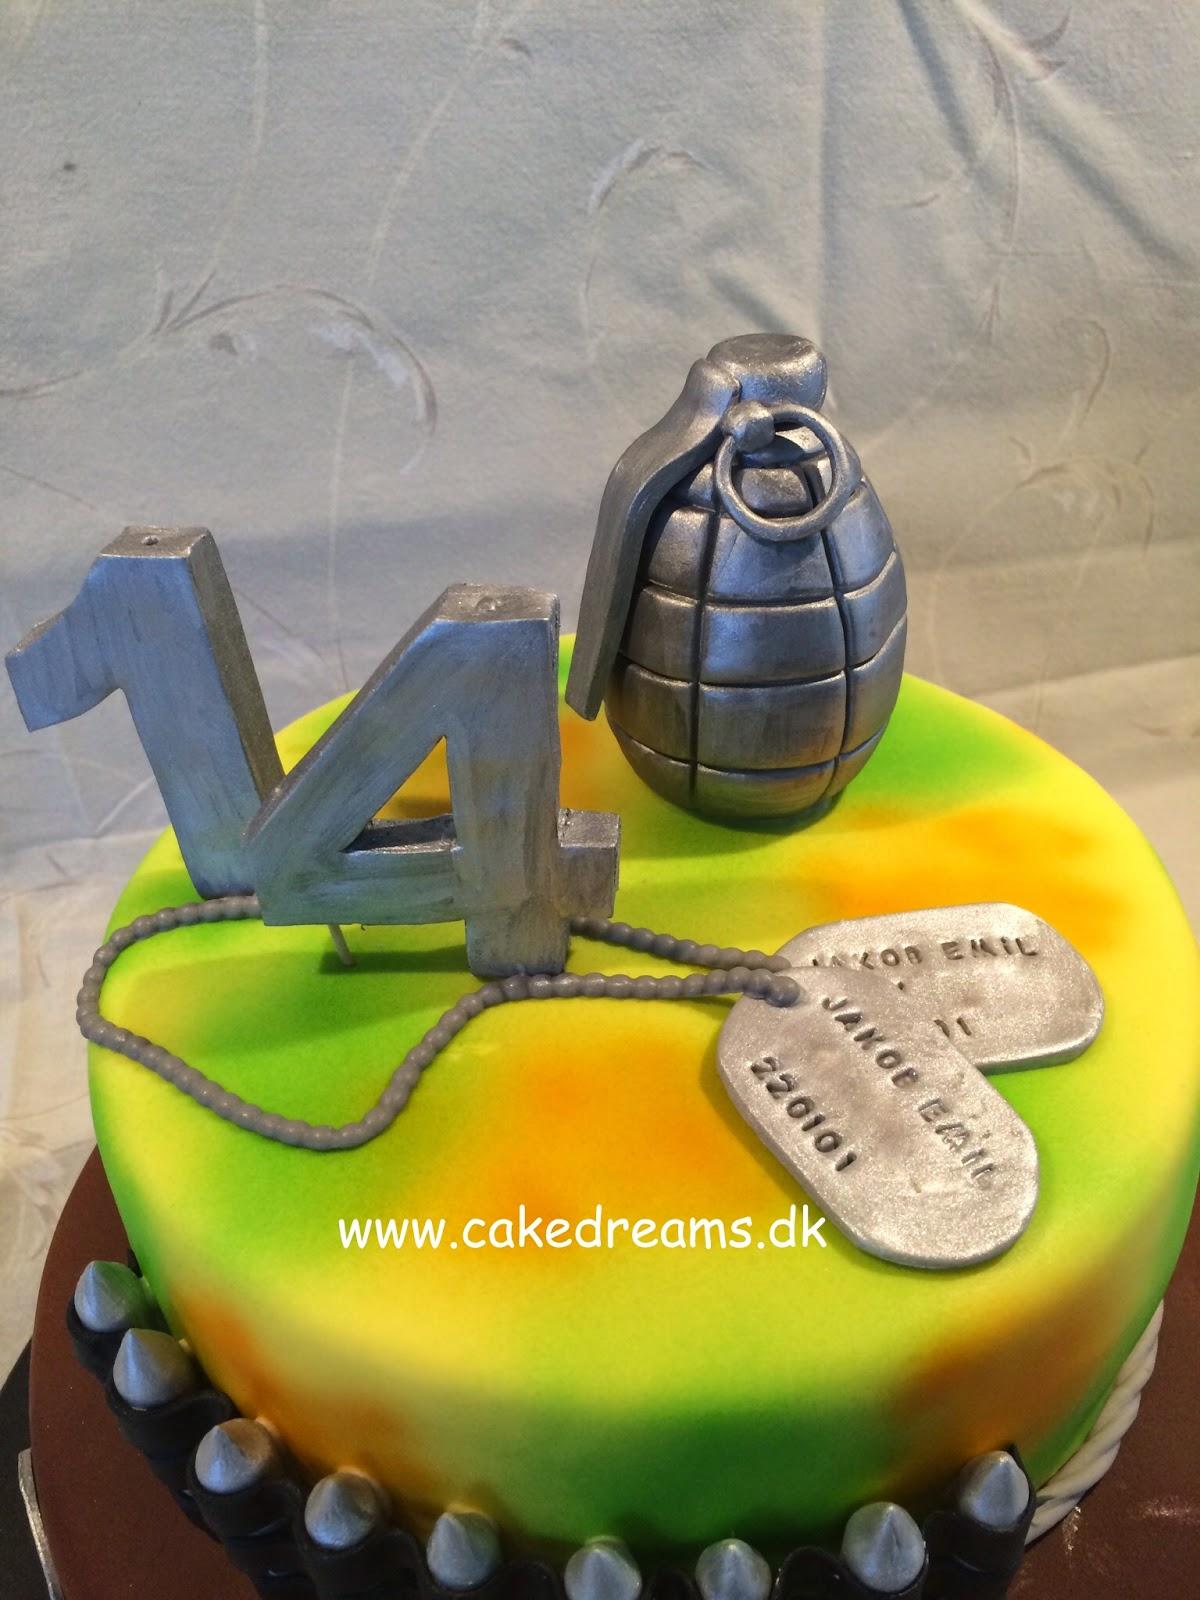 14 års fest CAKEDREAMS: Sønnikes 14 års fødselsdag 14 års fest